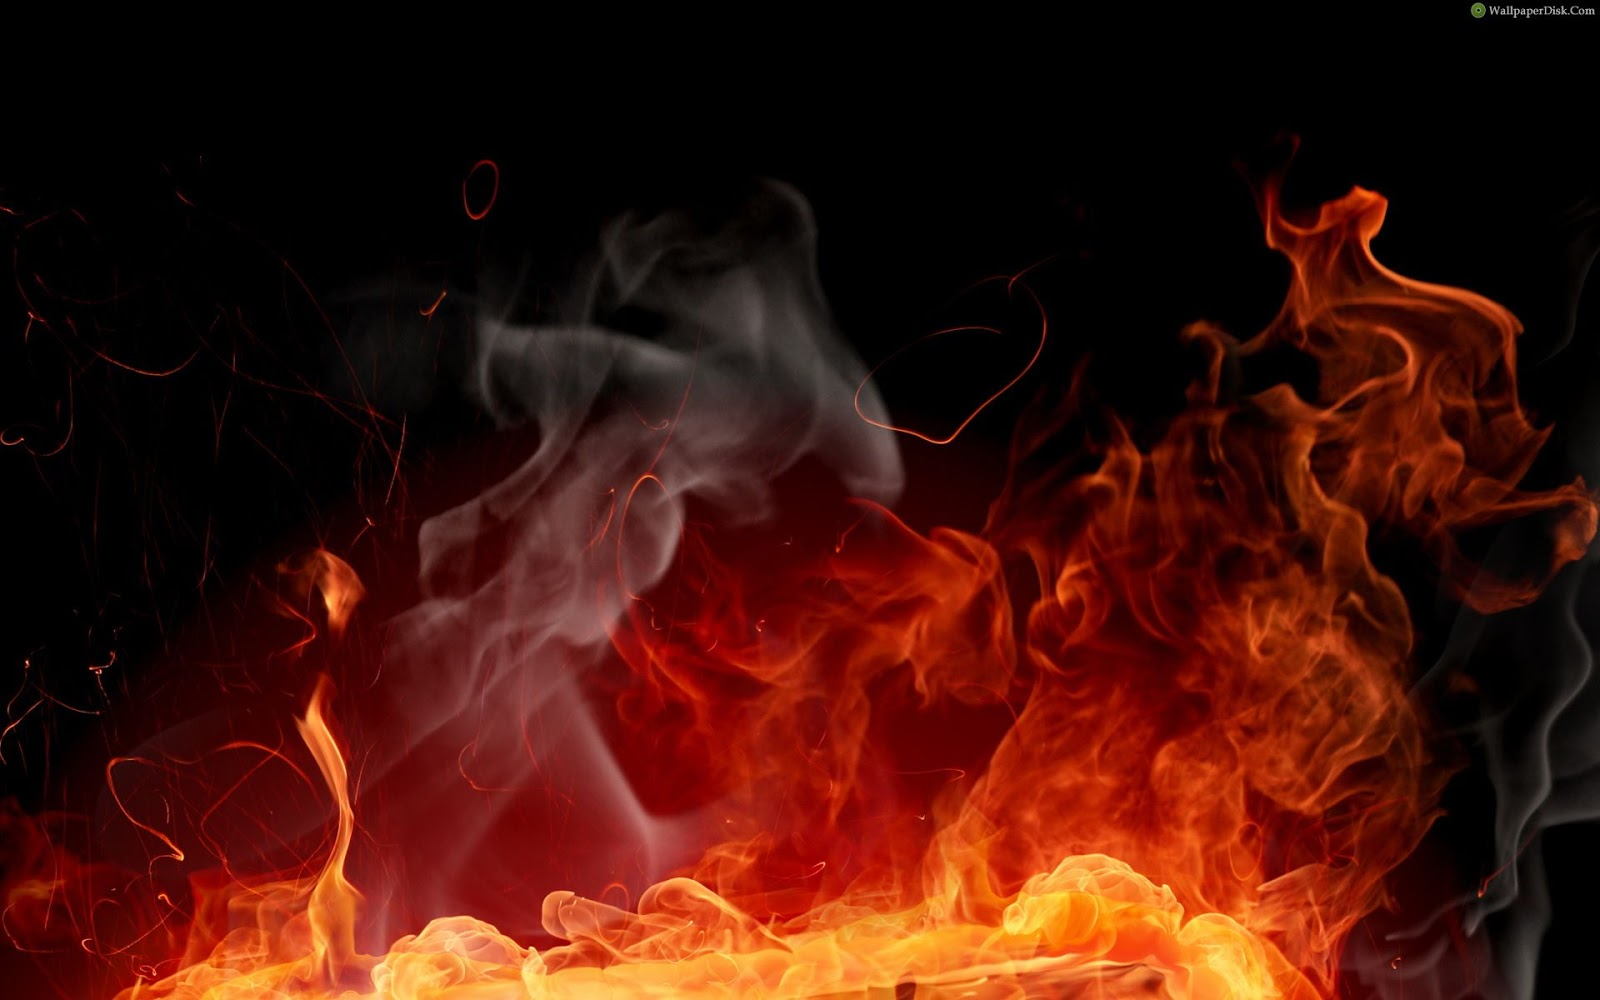 hd wallpapers desktop fire - photo #15